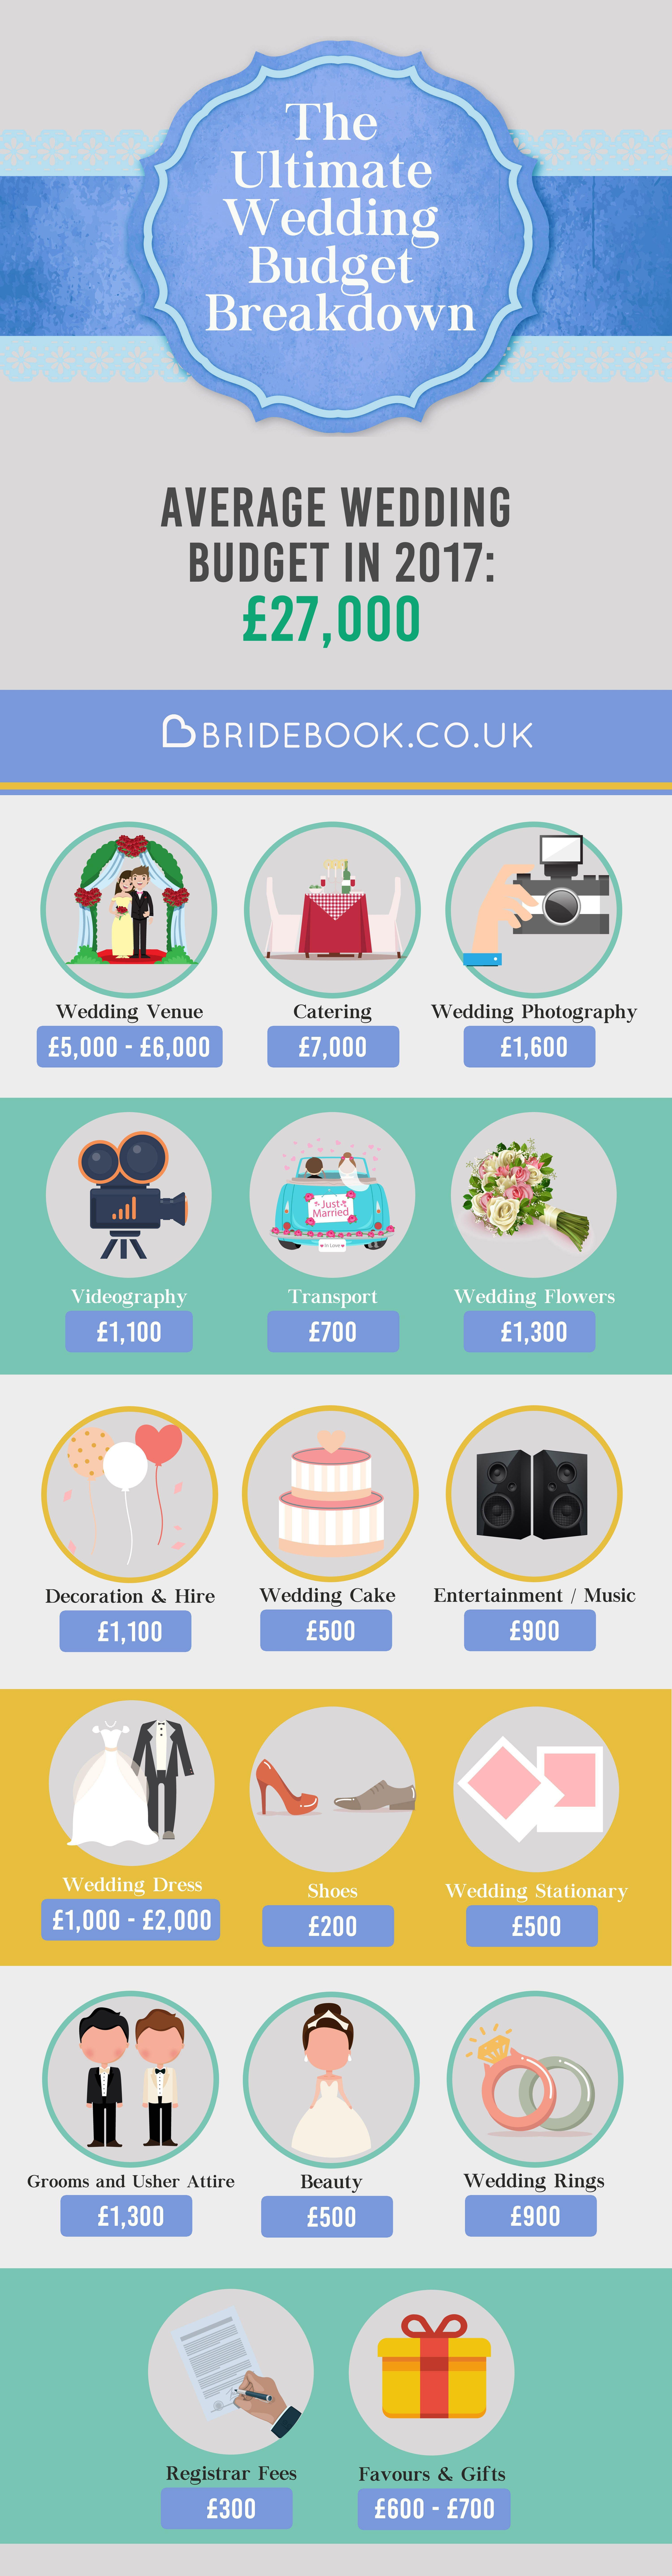 the ultimate wedding budget breakdown in 2018 wedding tips